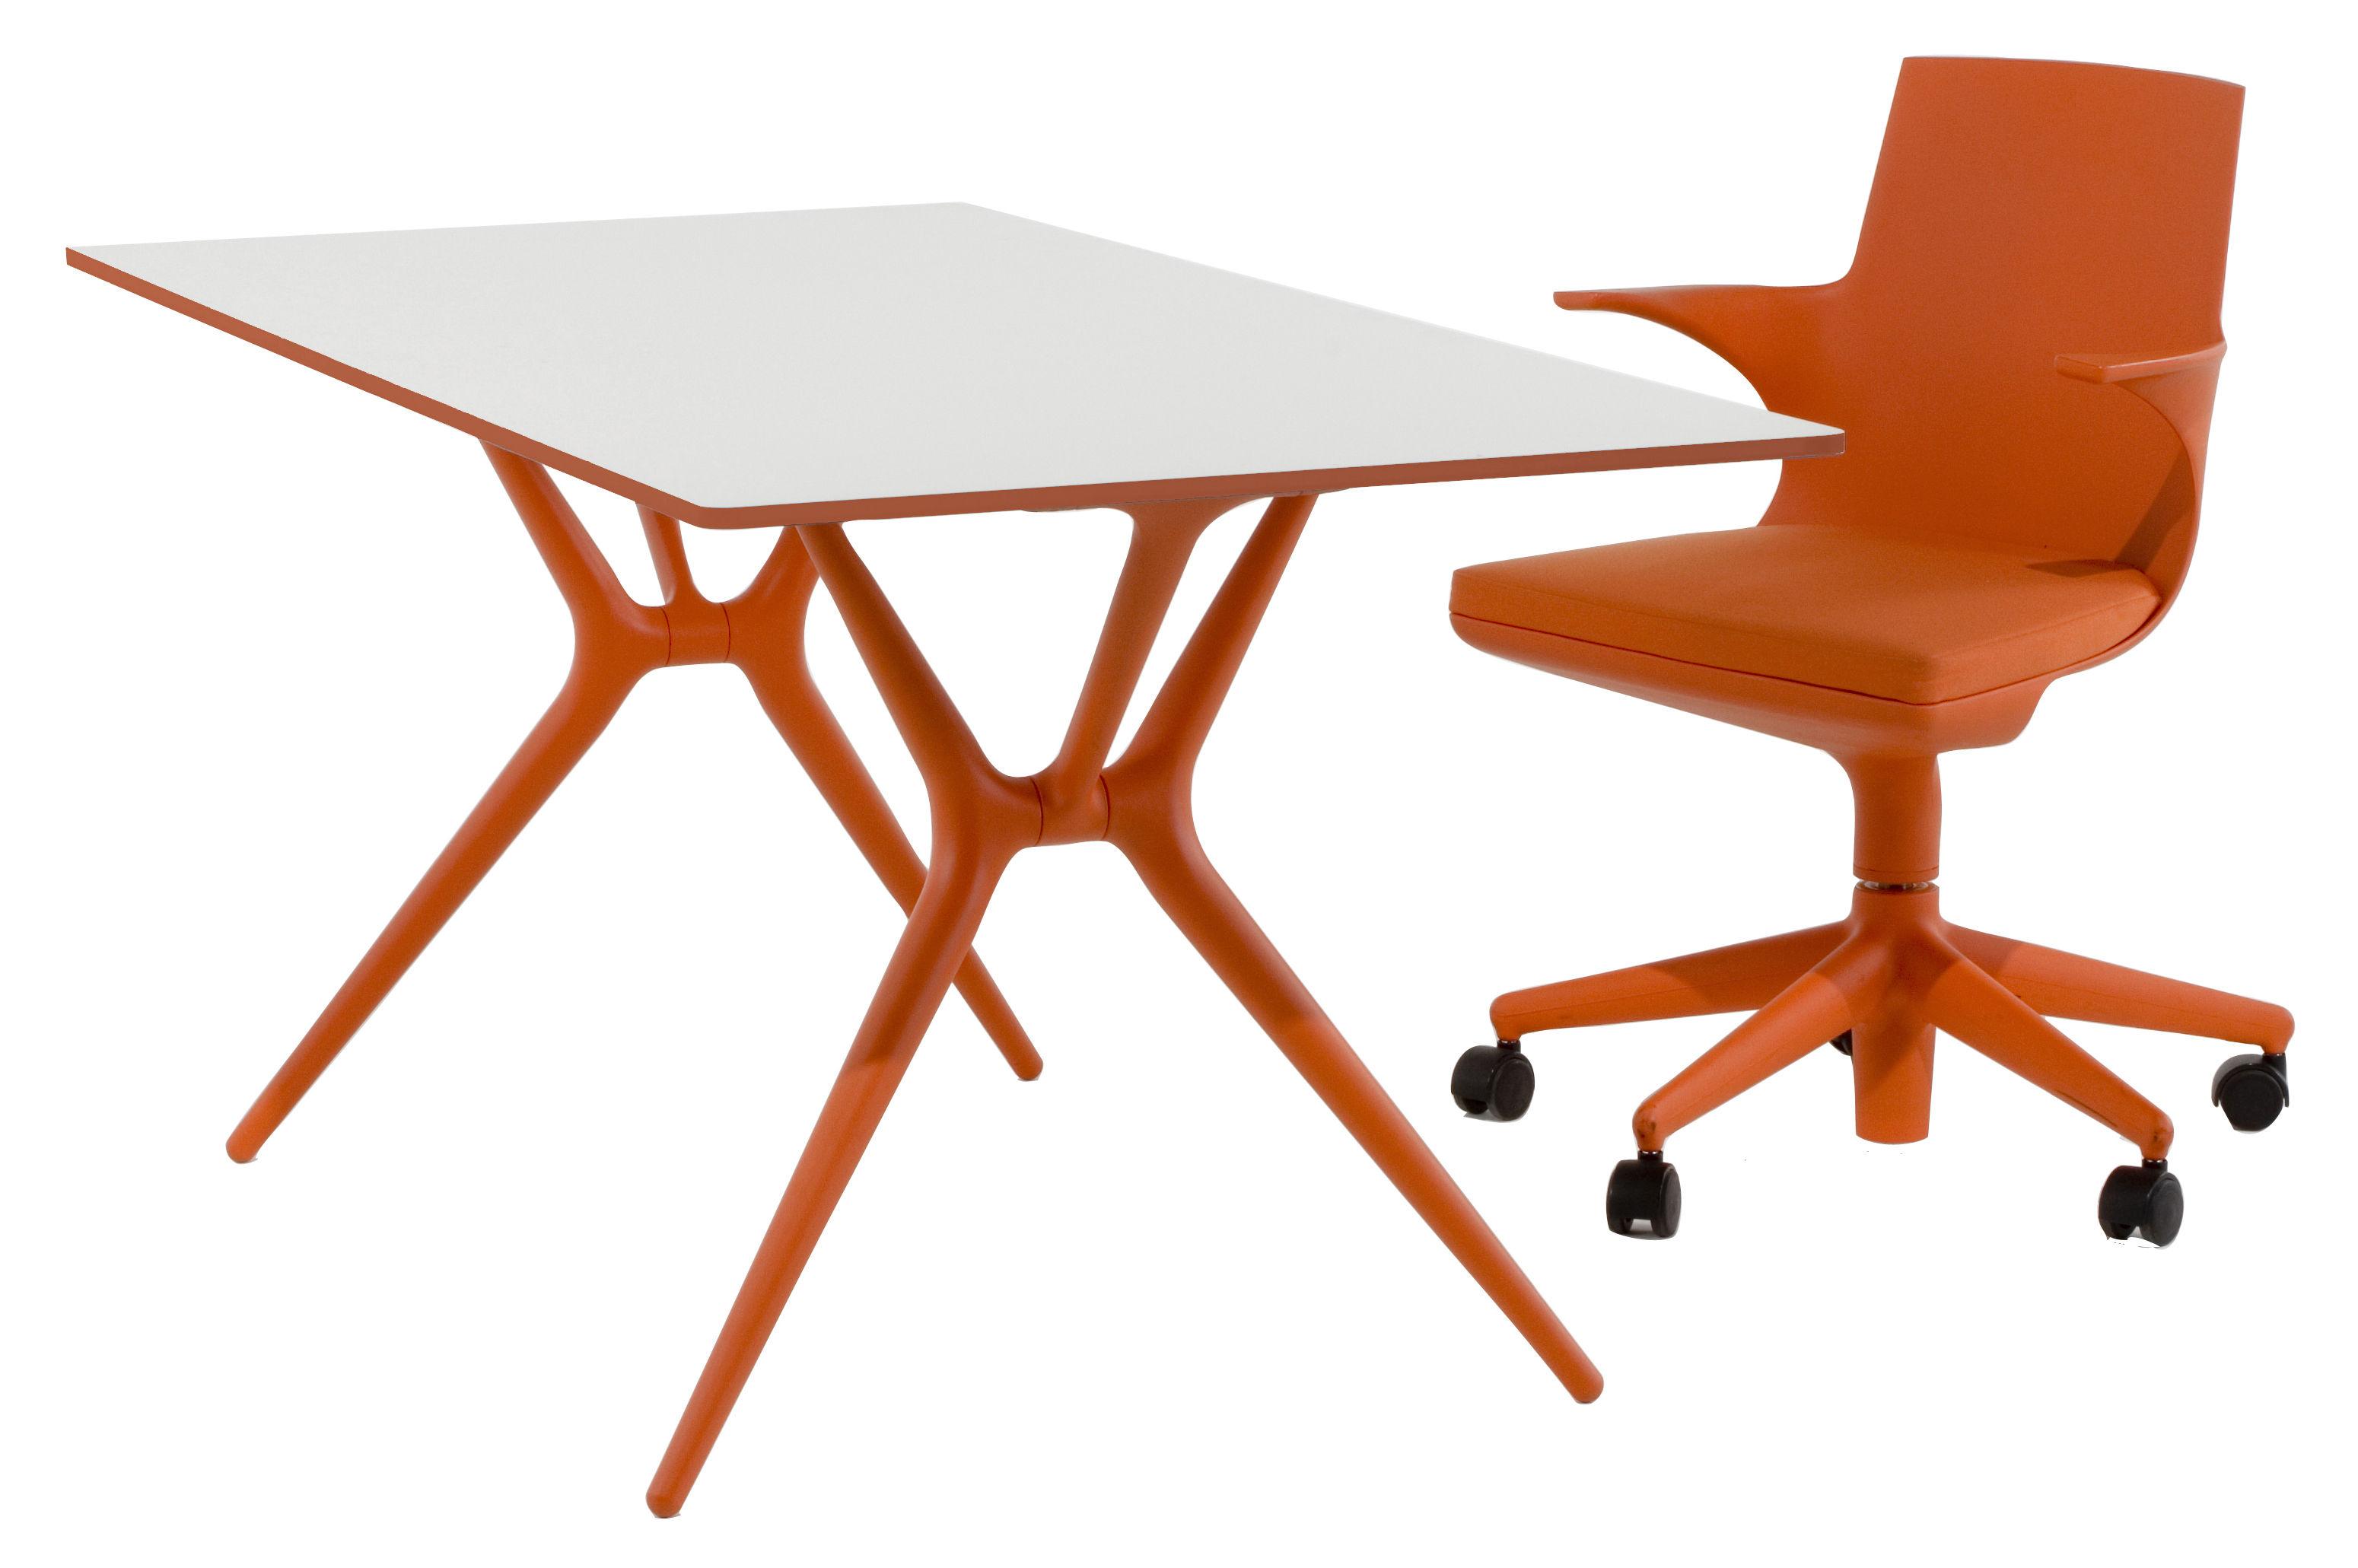 Table pliante spoon bureau 200 x 90 cm plateau blanc pieds orange kartell for Bureau kartell